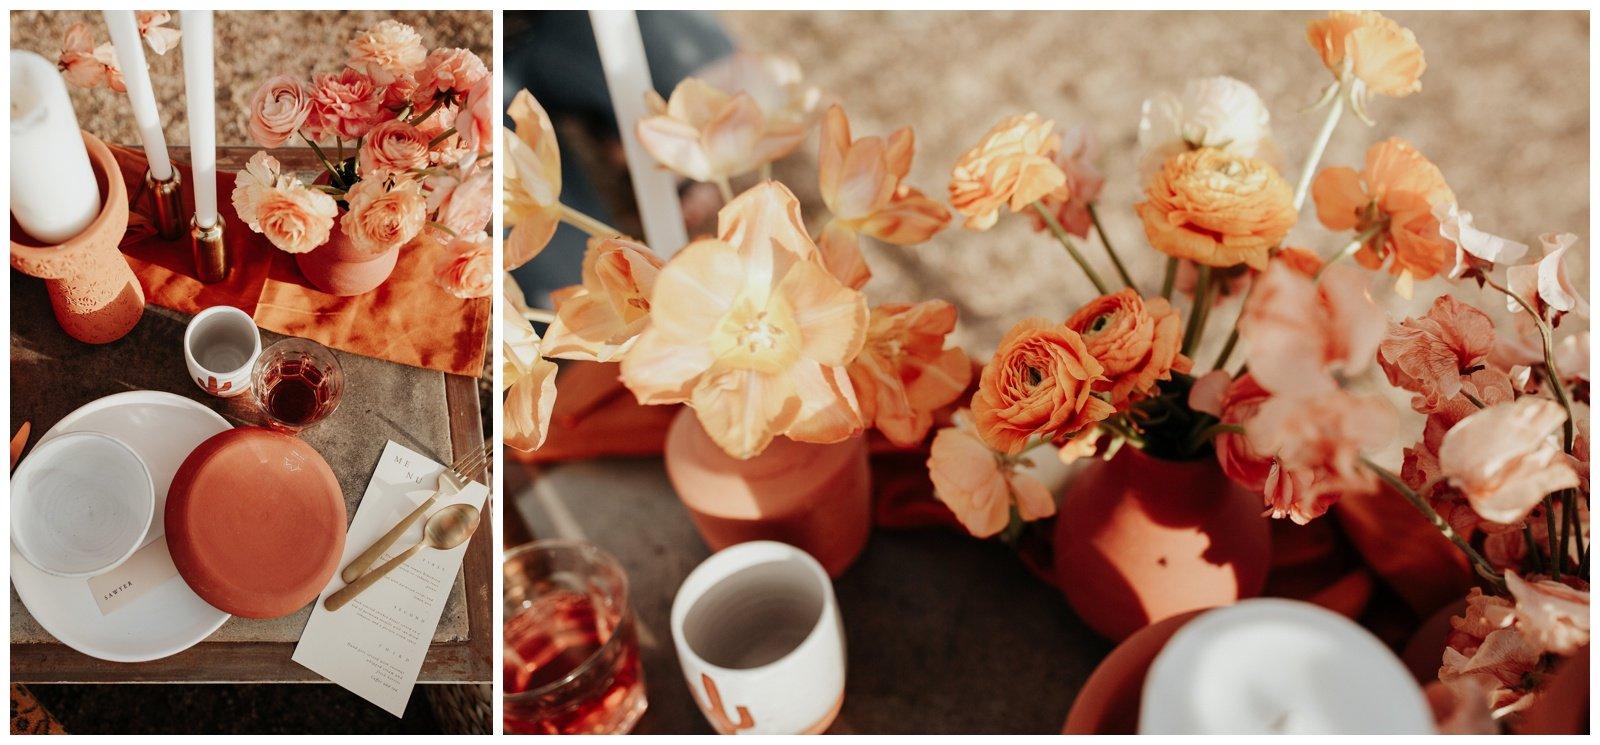 Wedding dinner set up in the desert, candles and terracotta bud vases